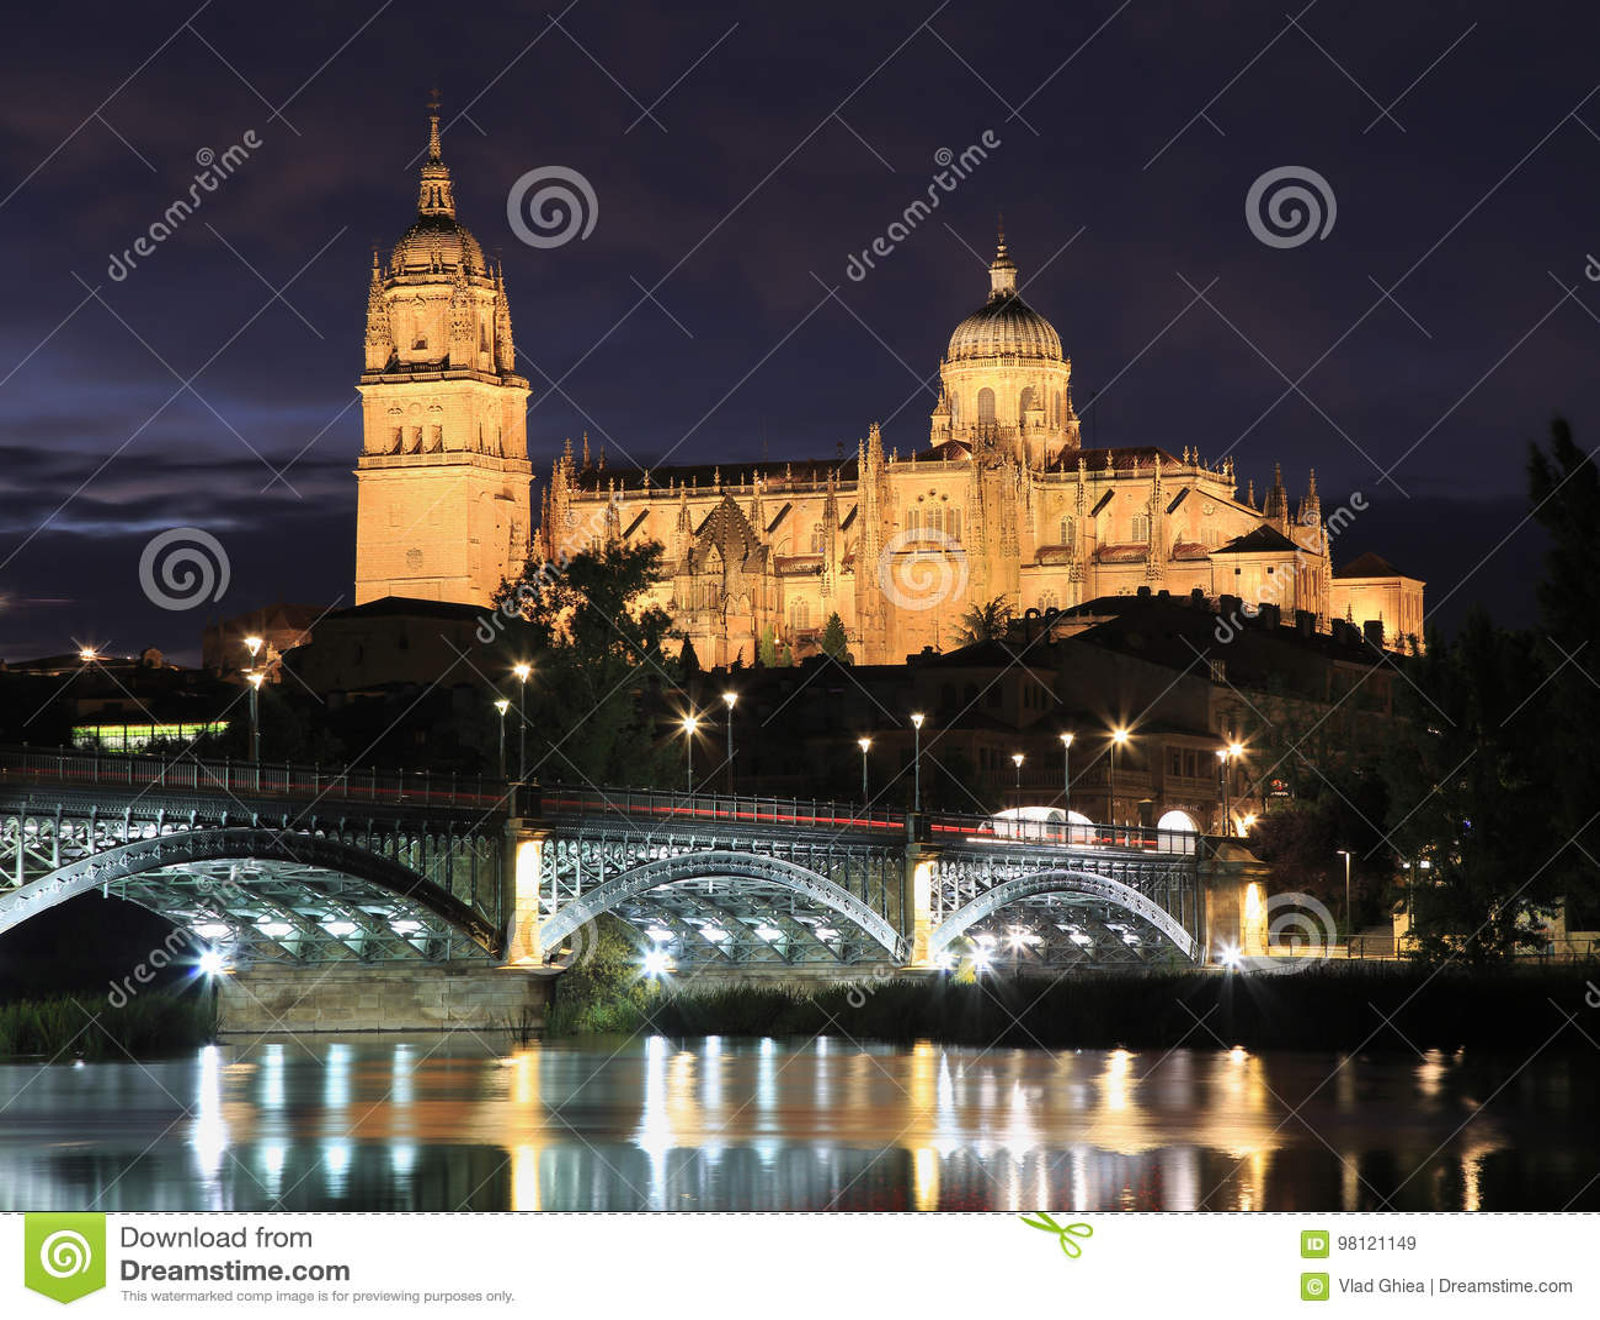 Salamanca skyline at night in Enrique Estevan bridge over Tormes River